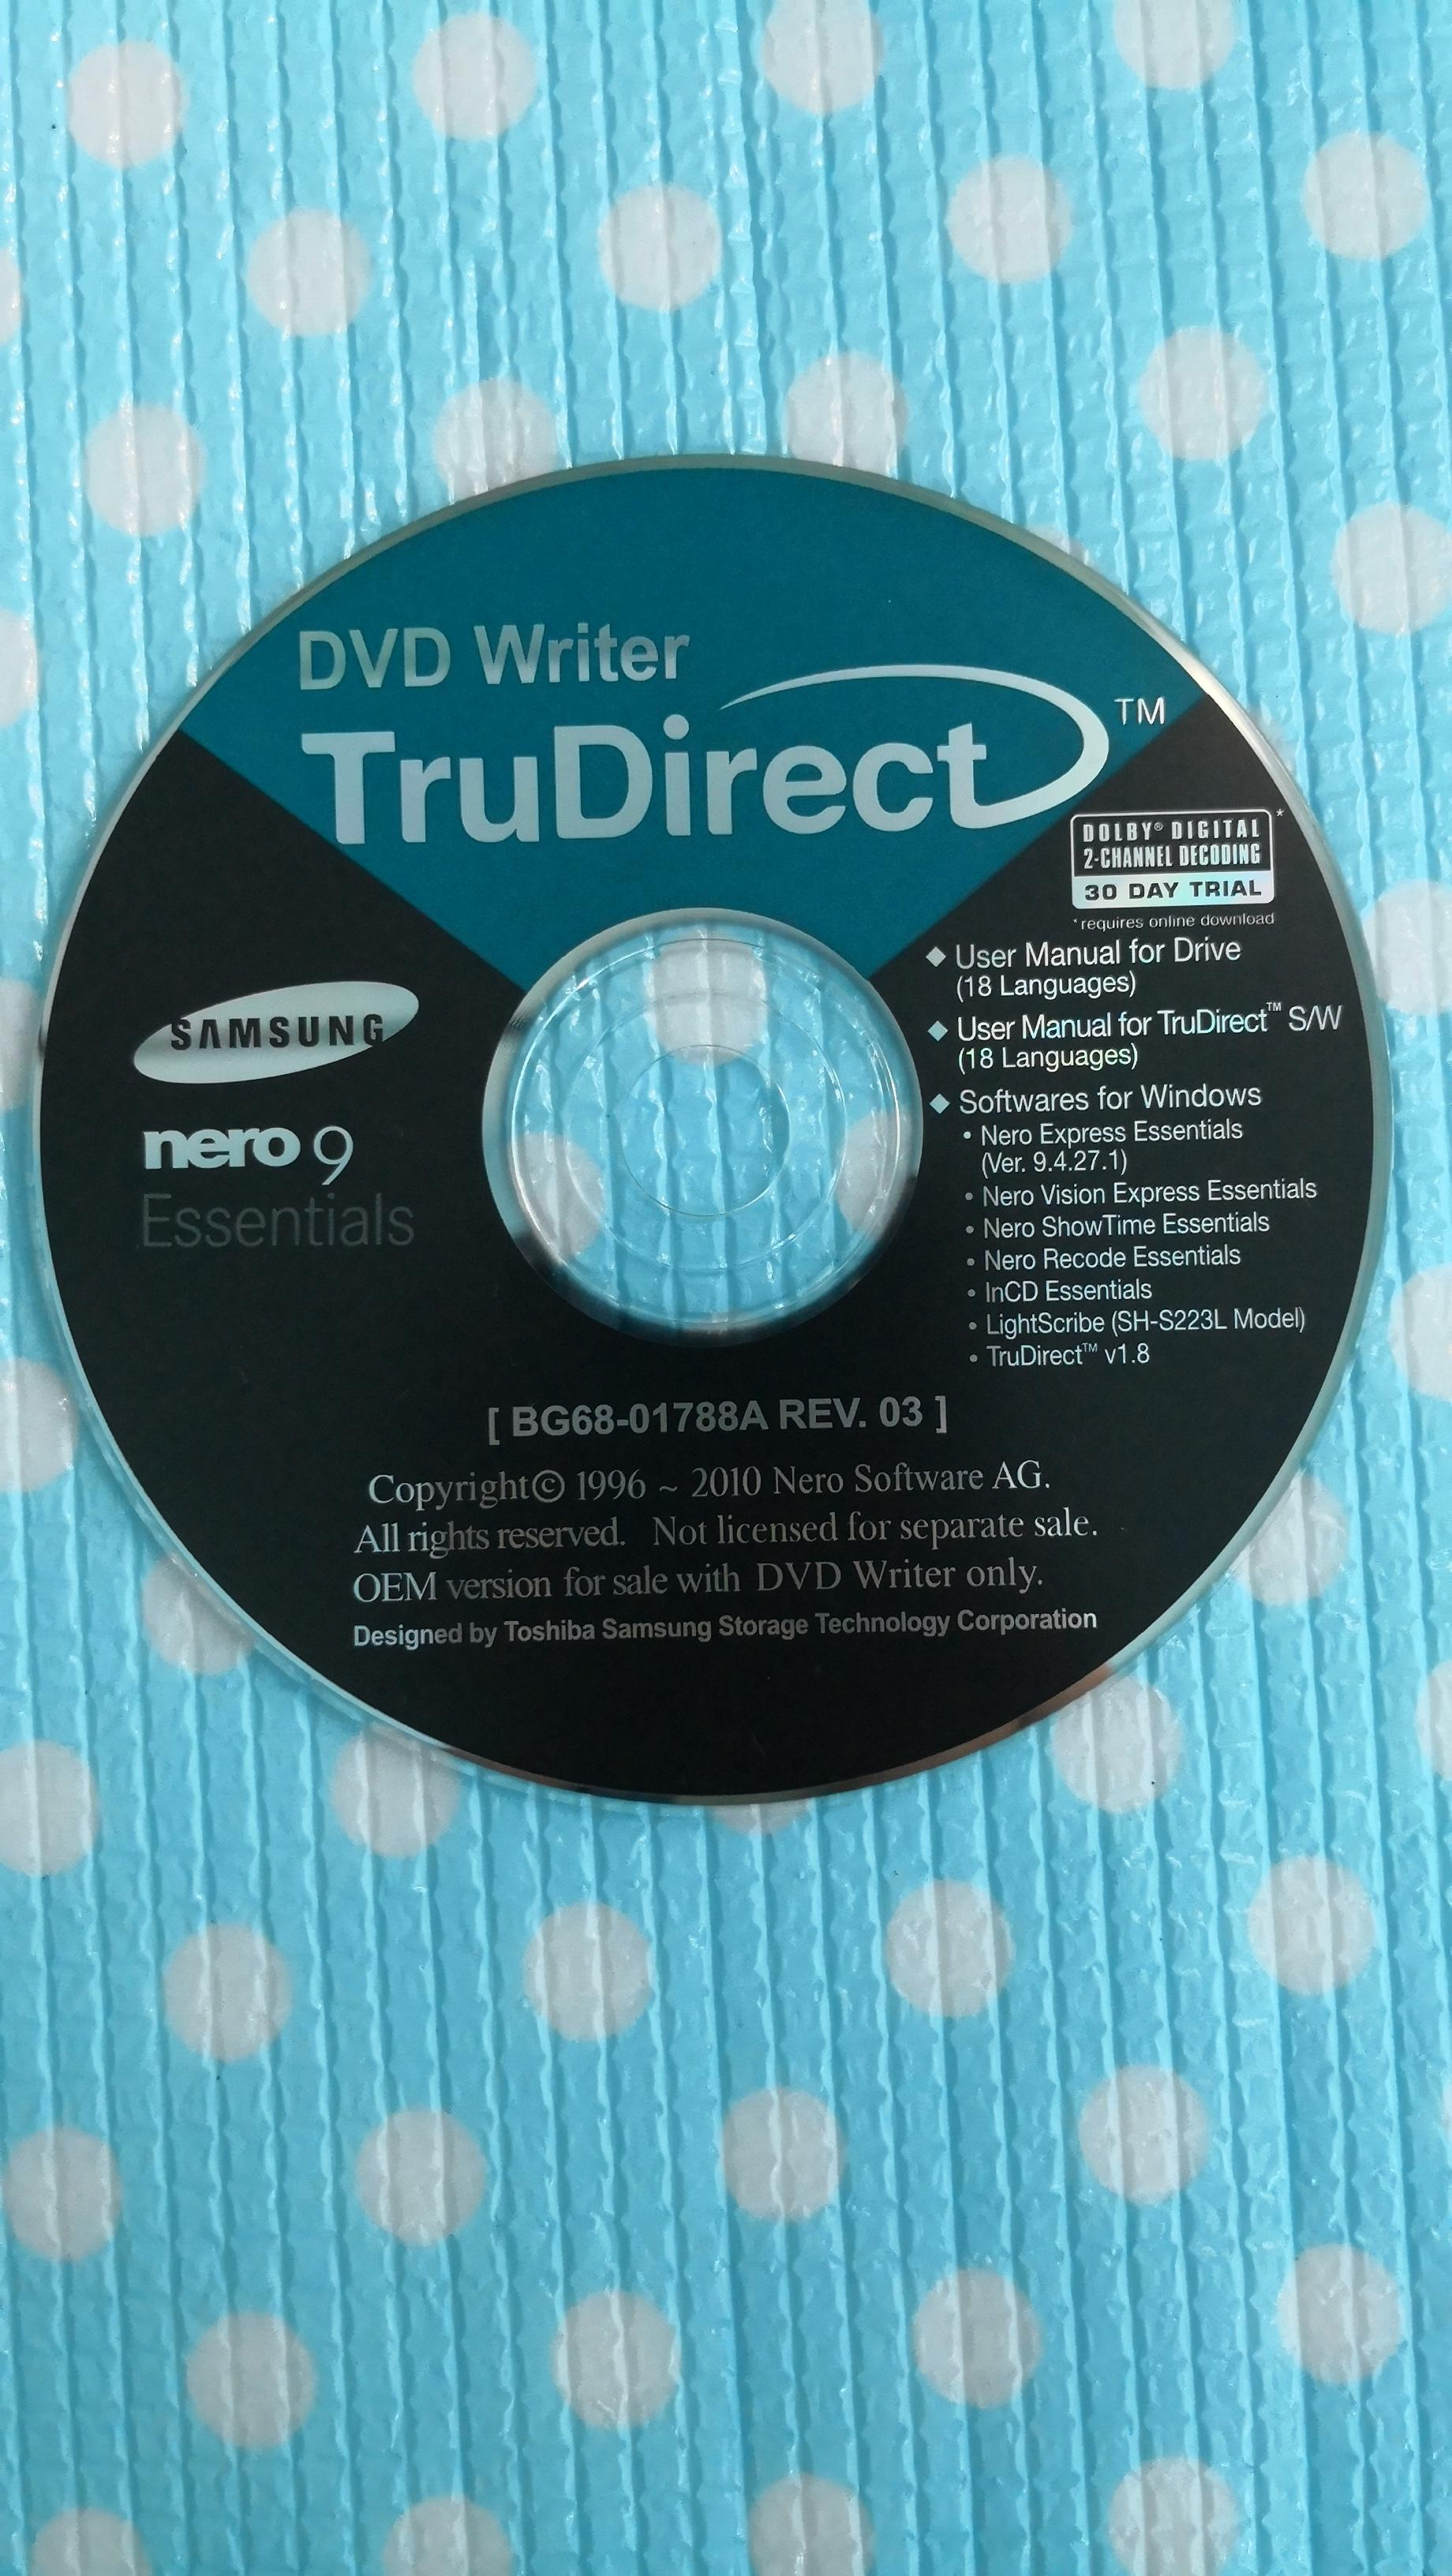 Nero CD/ DVD burning sofware